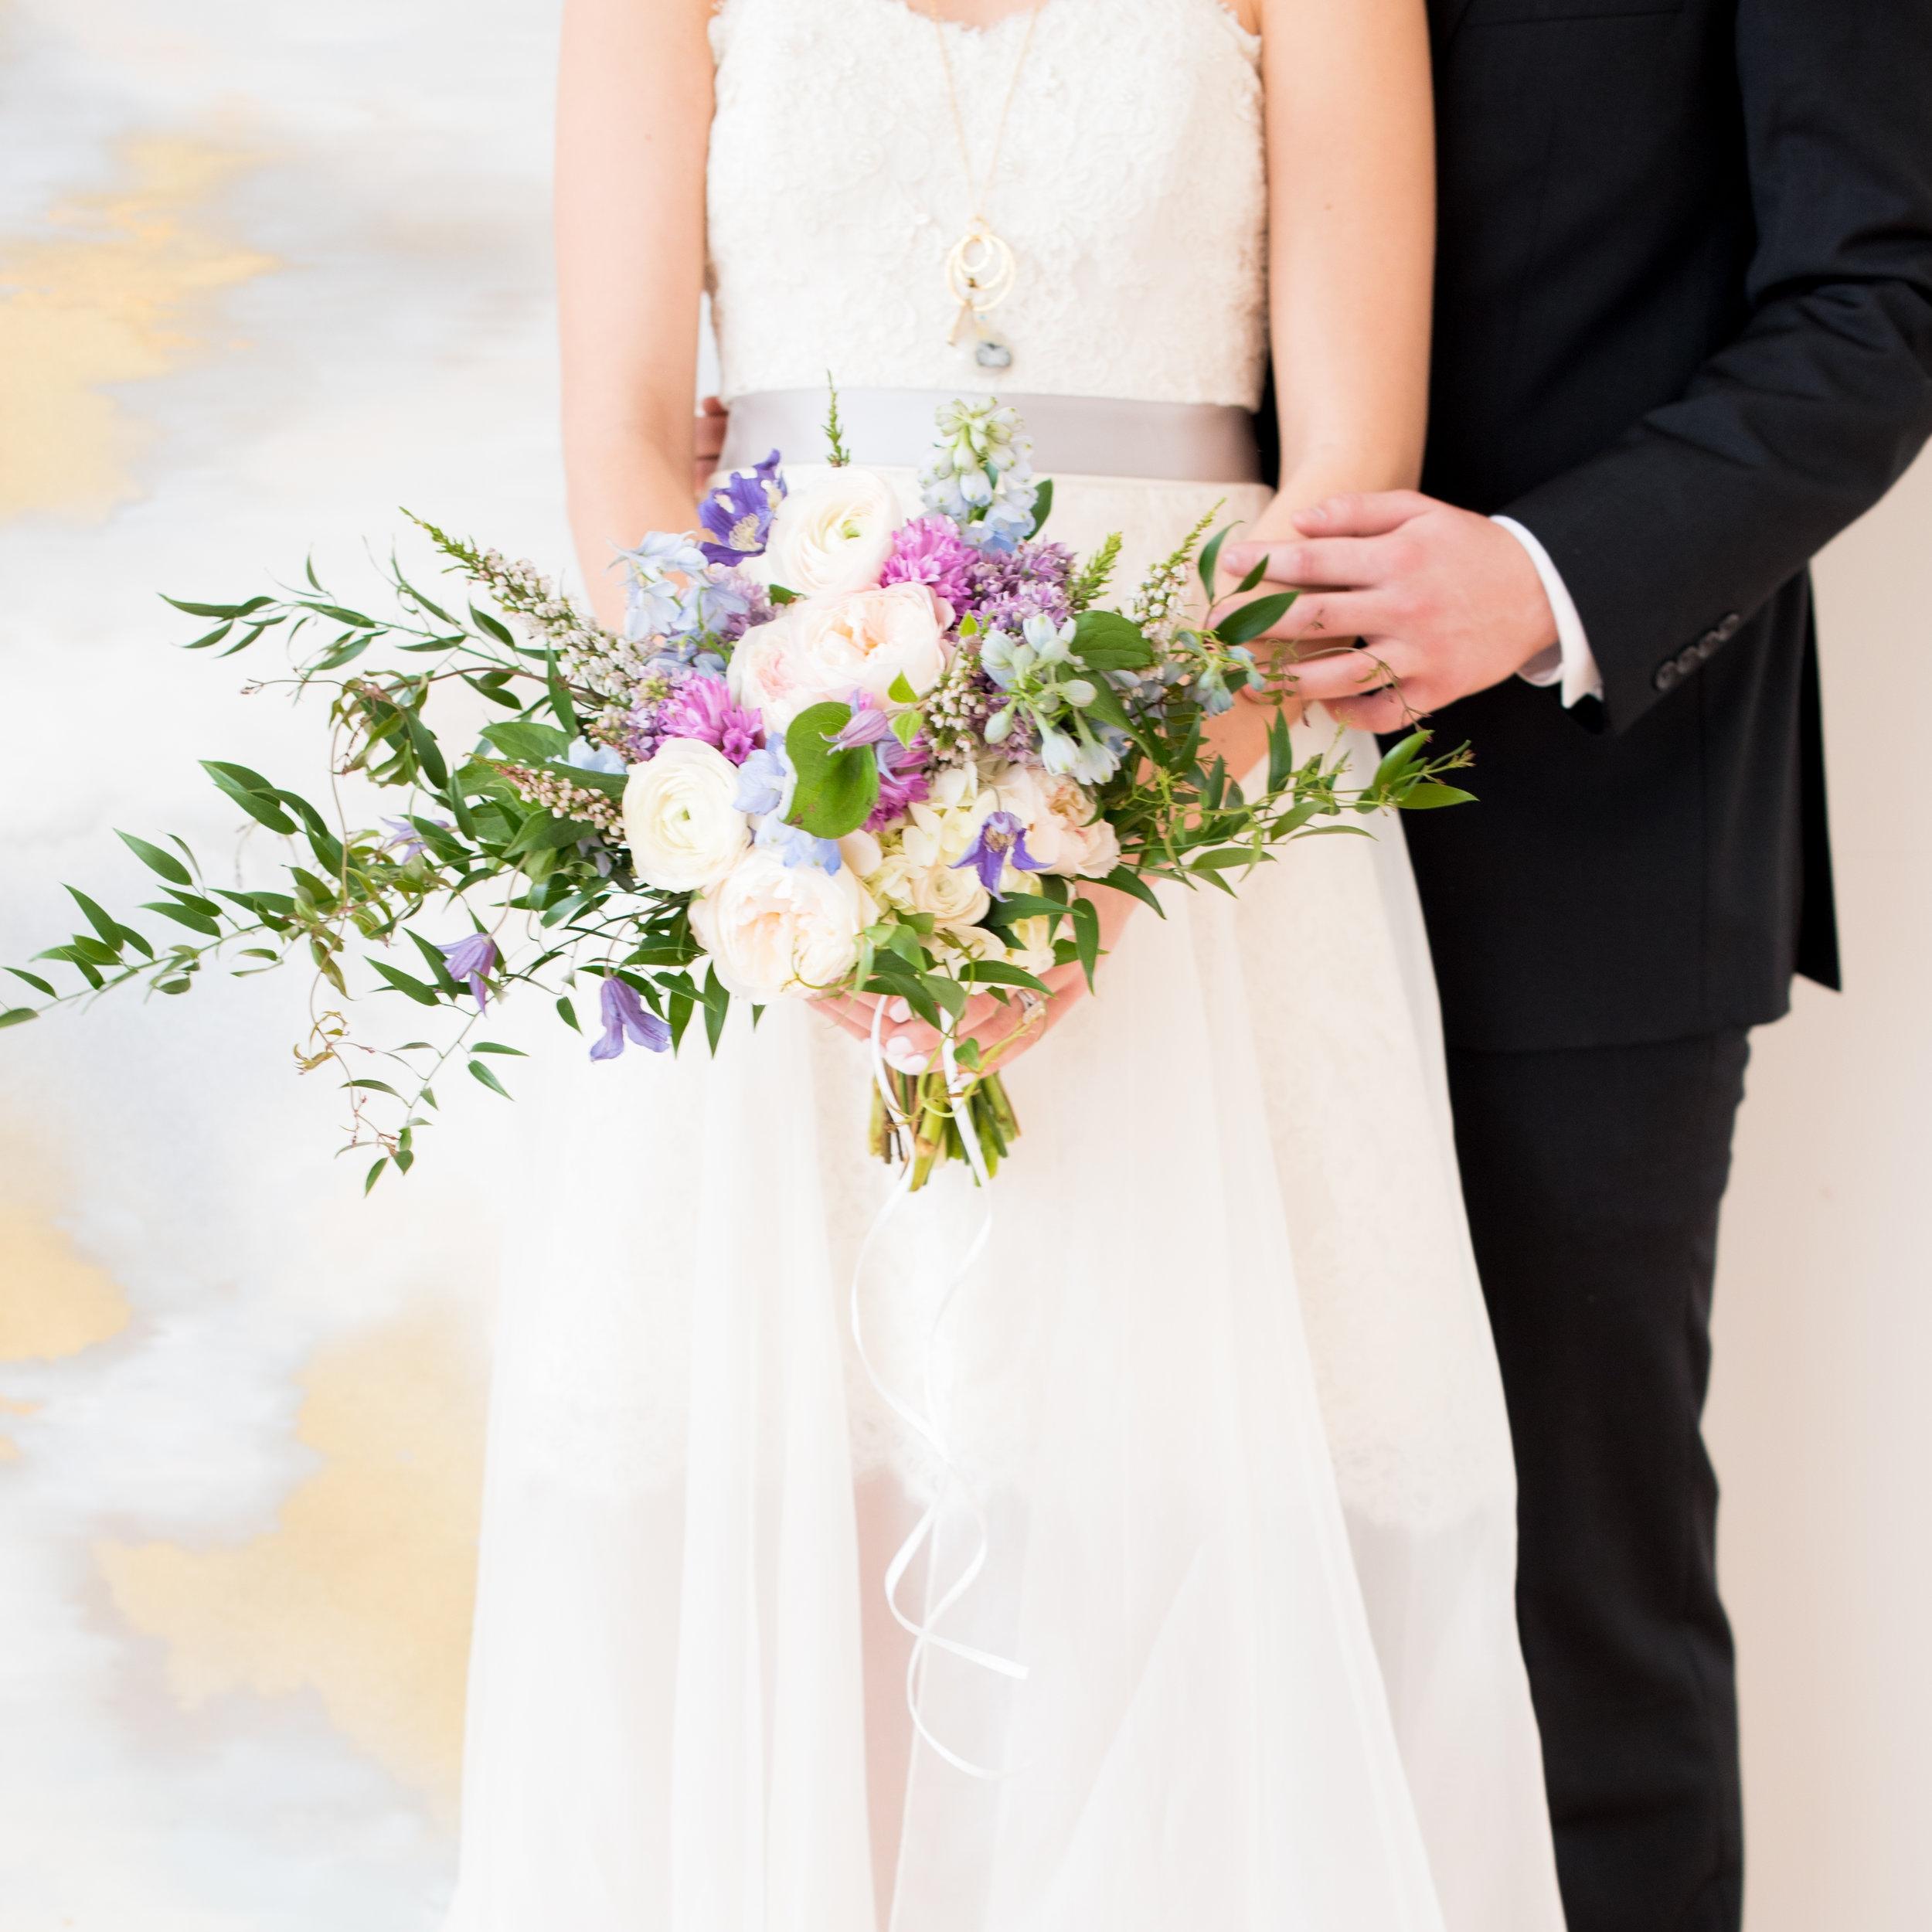 mikkelpaige-the_glassbox-raleigh_wedding-paper_crafted-032.jpg